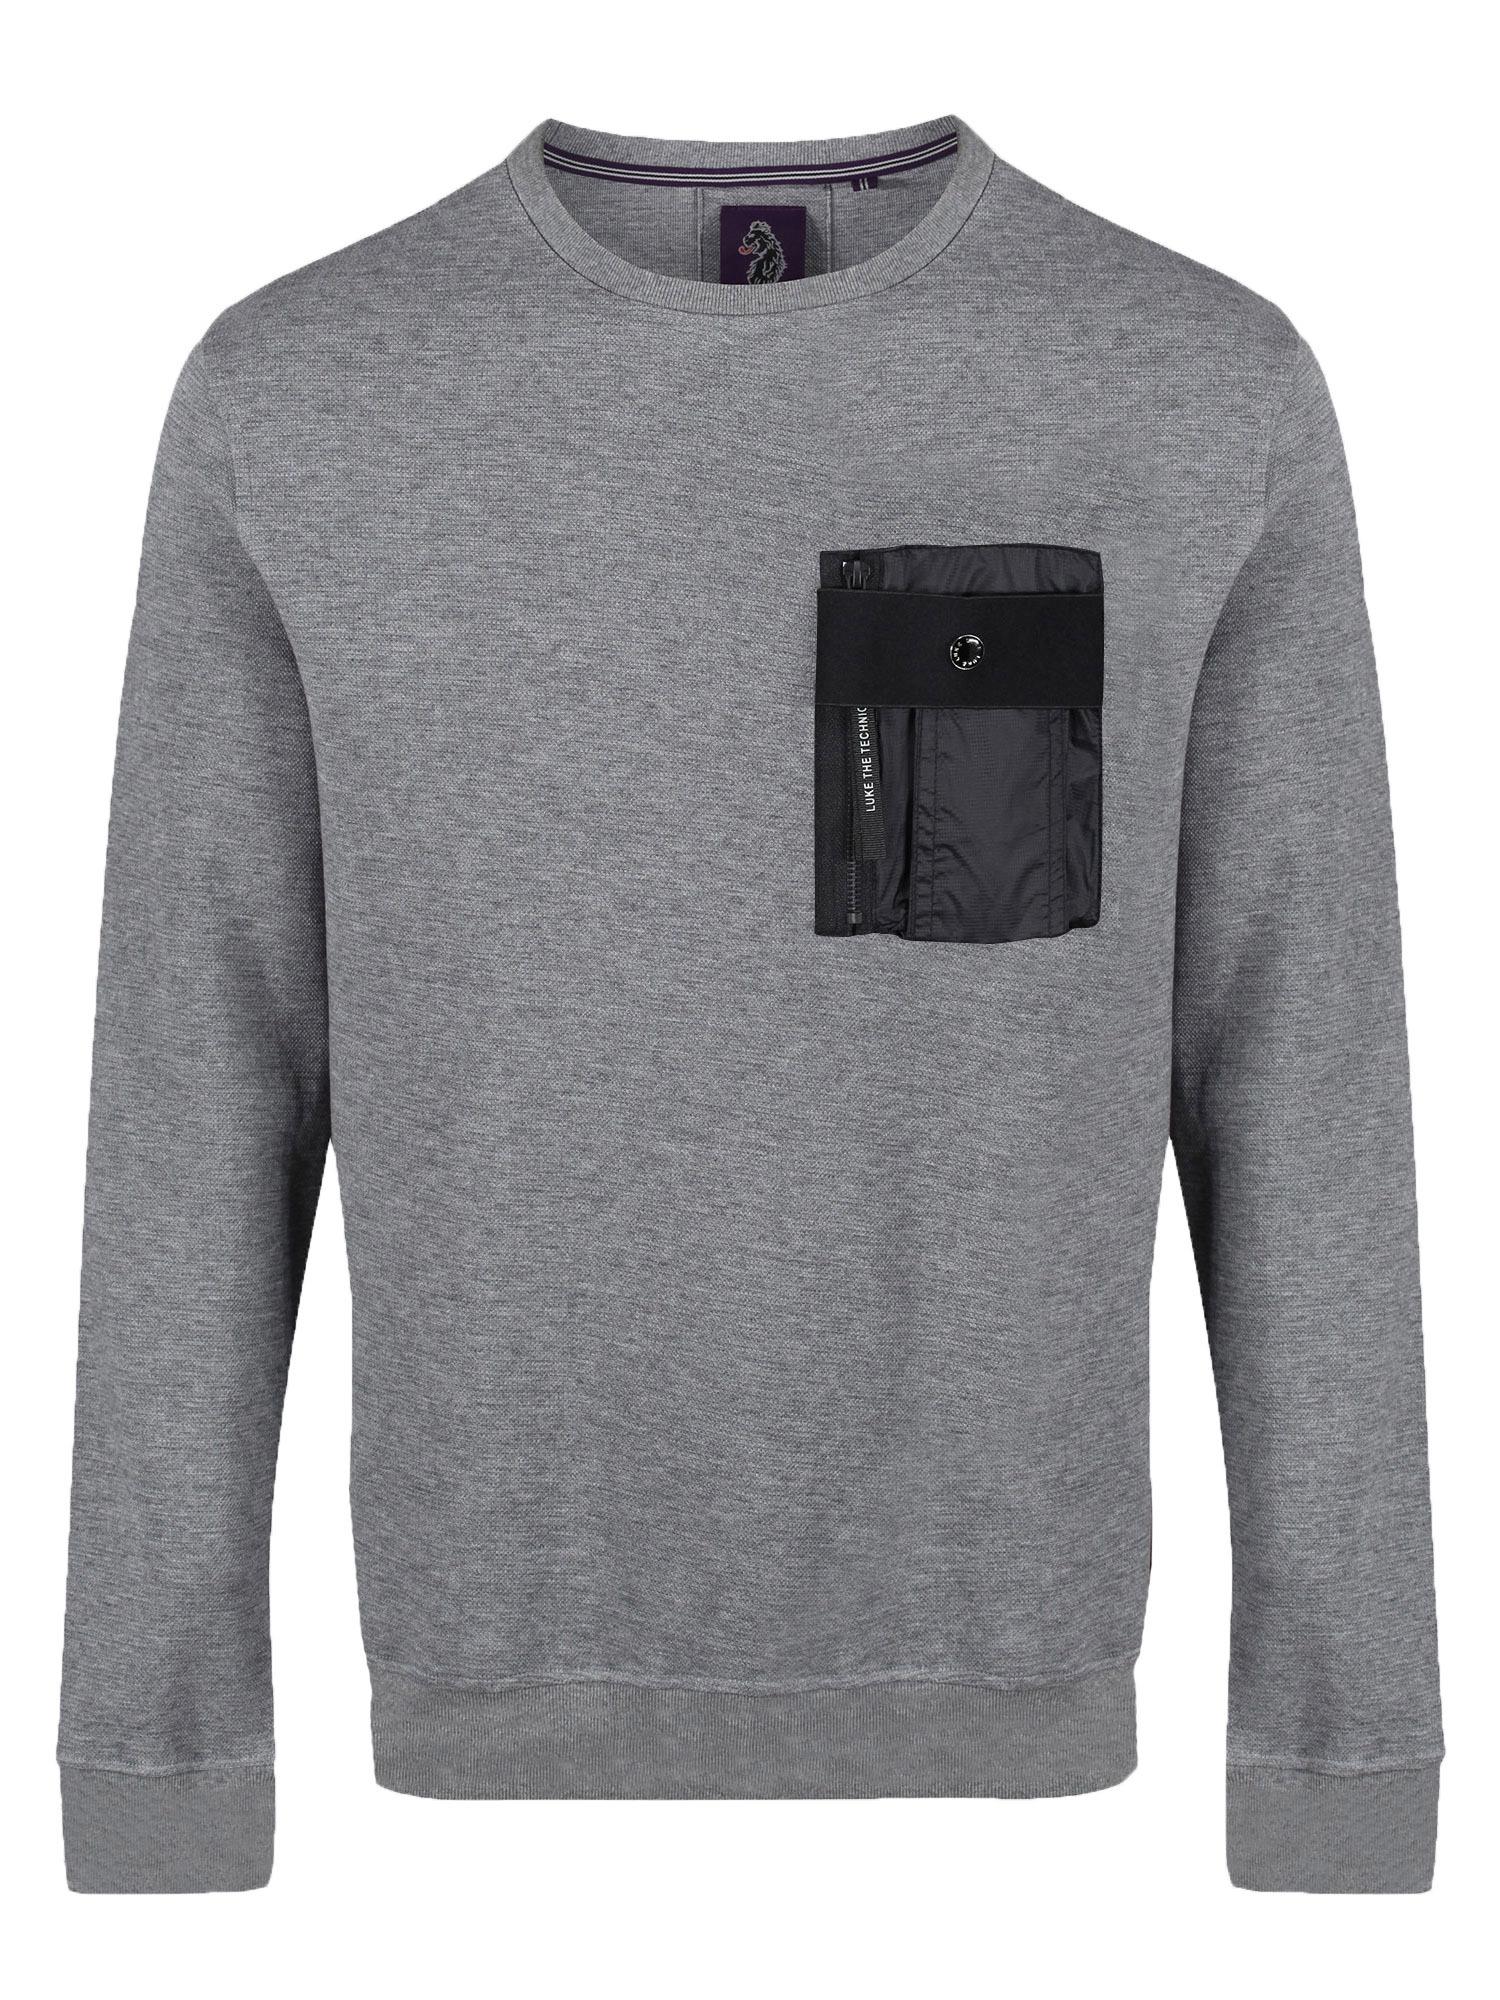 LUKE 1977 O Levels Pocket Detail Sweatshirt